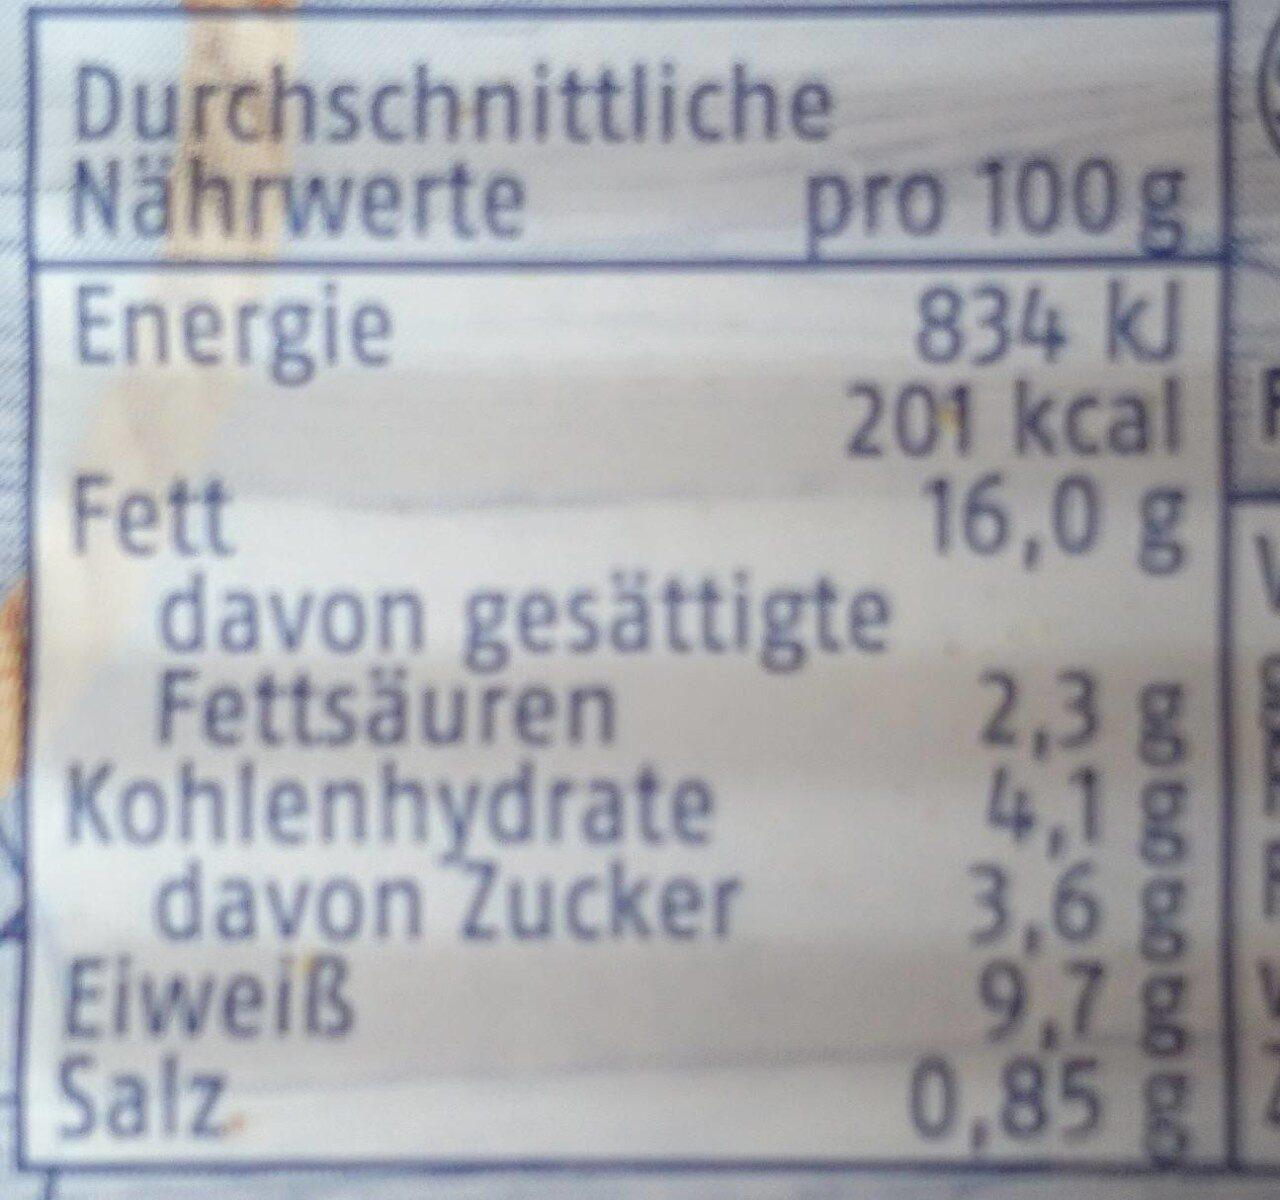 Heringsfilet in Paprika-Creme - Informations nutritionnelles - de